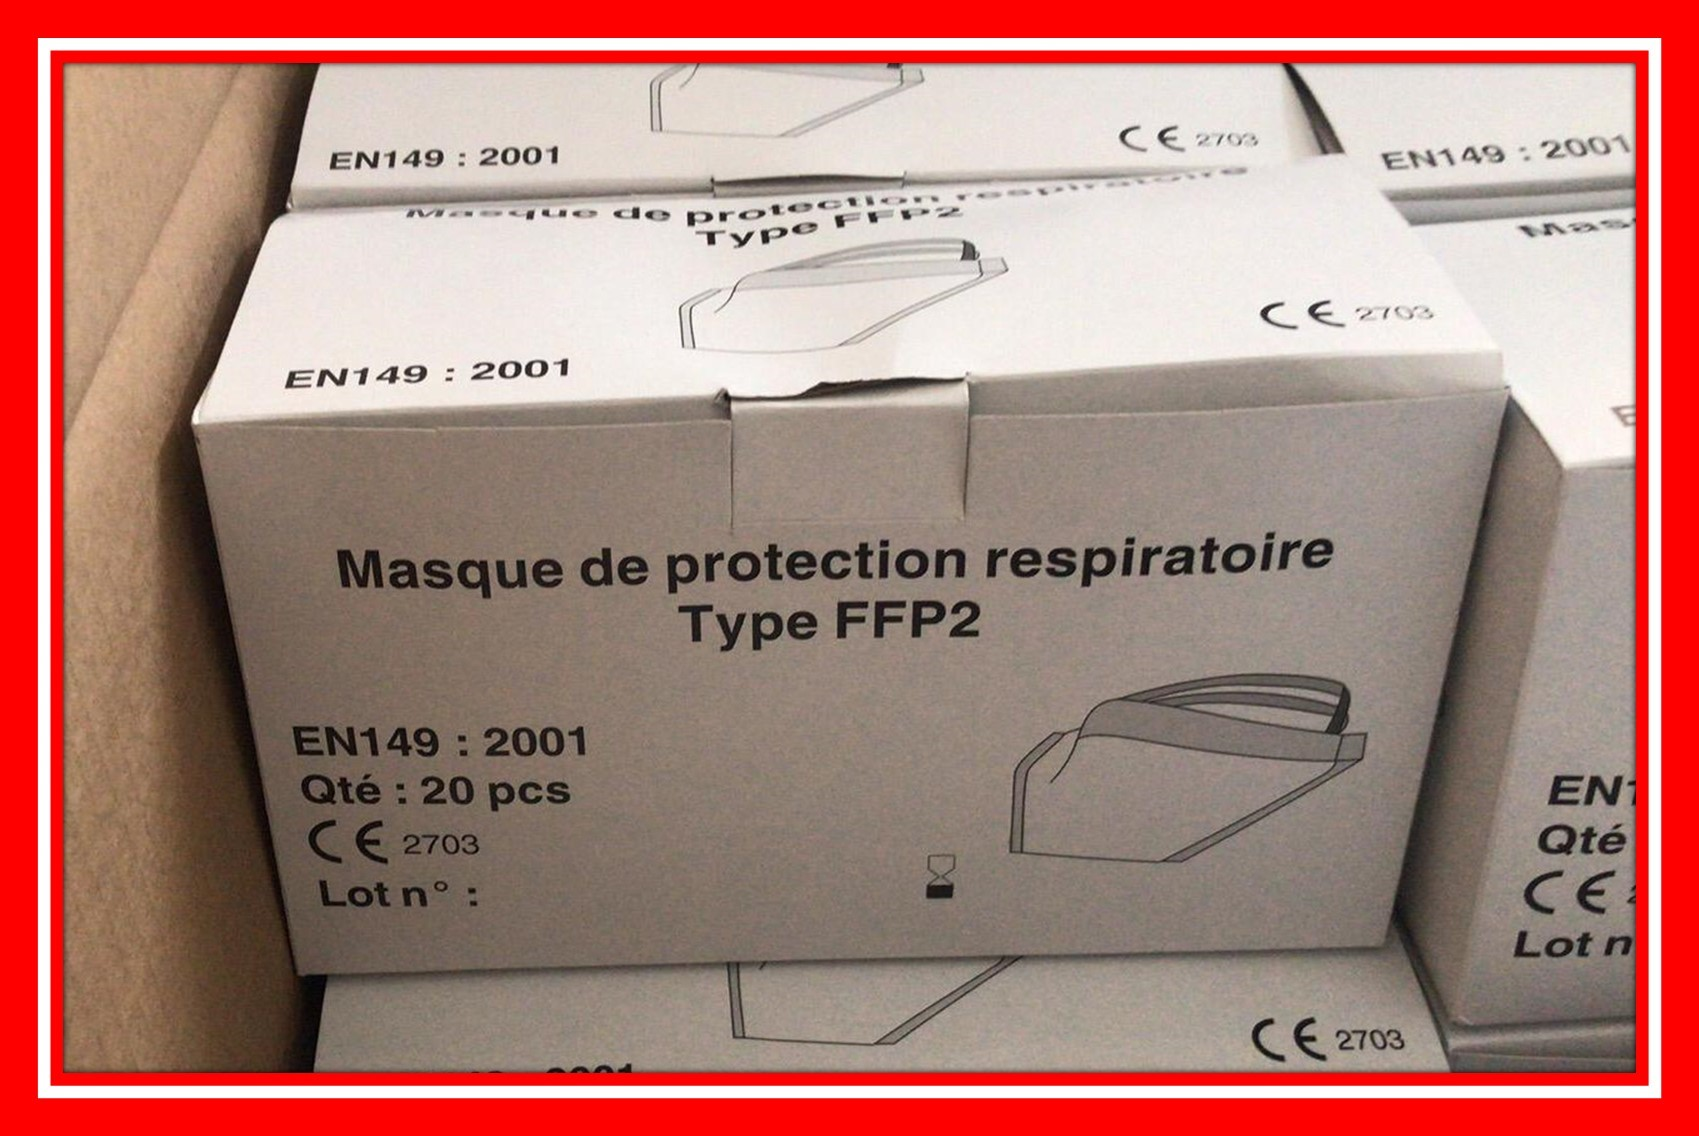 https://www.baua.de/media/images_produktsicherheit/10009904-f.jpg